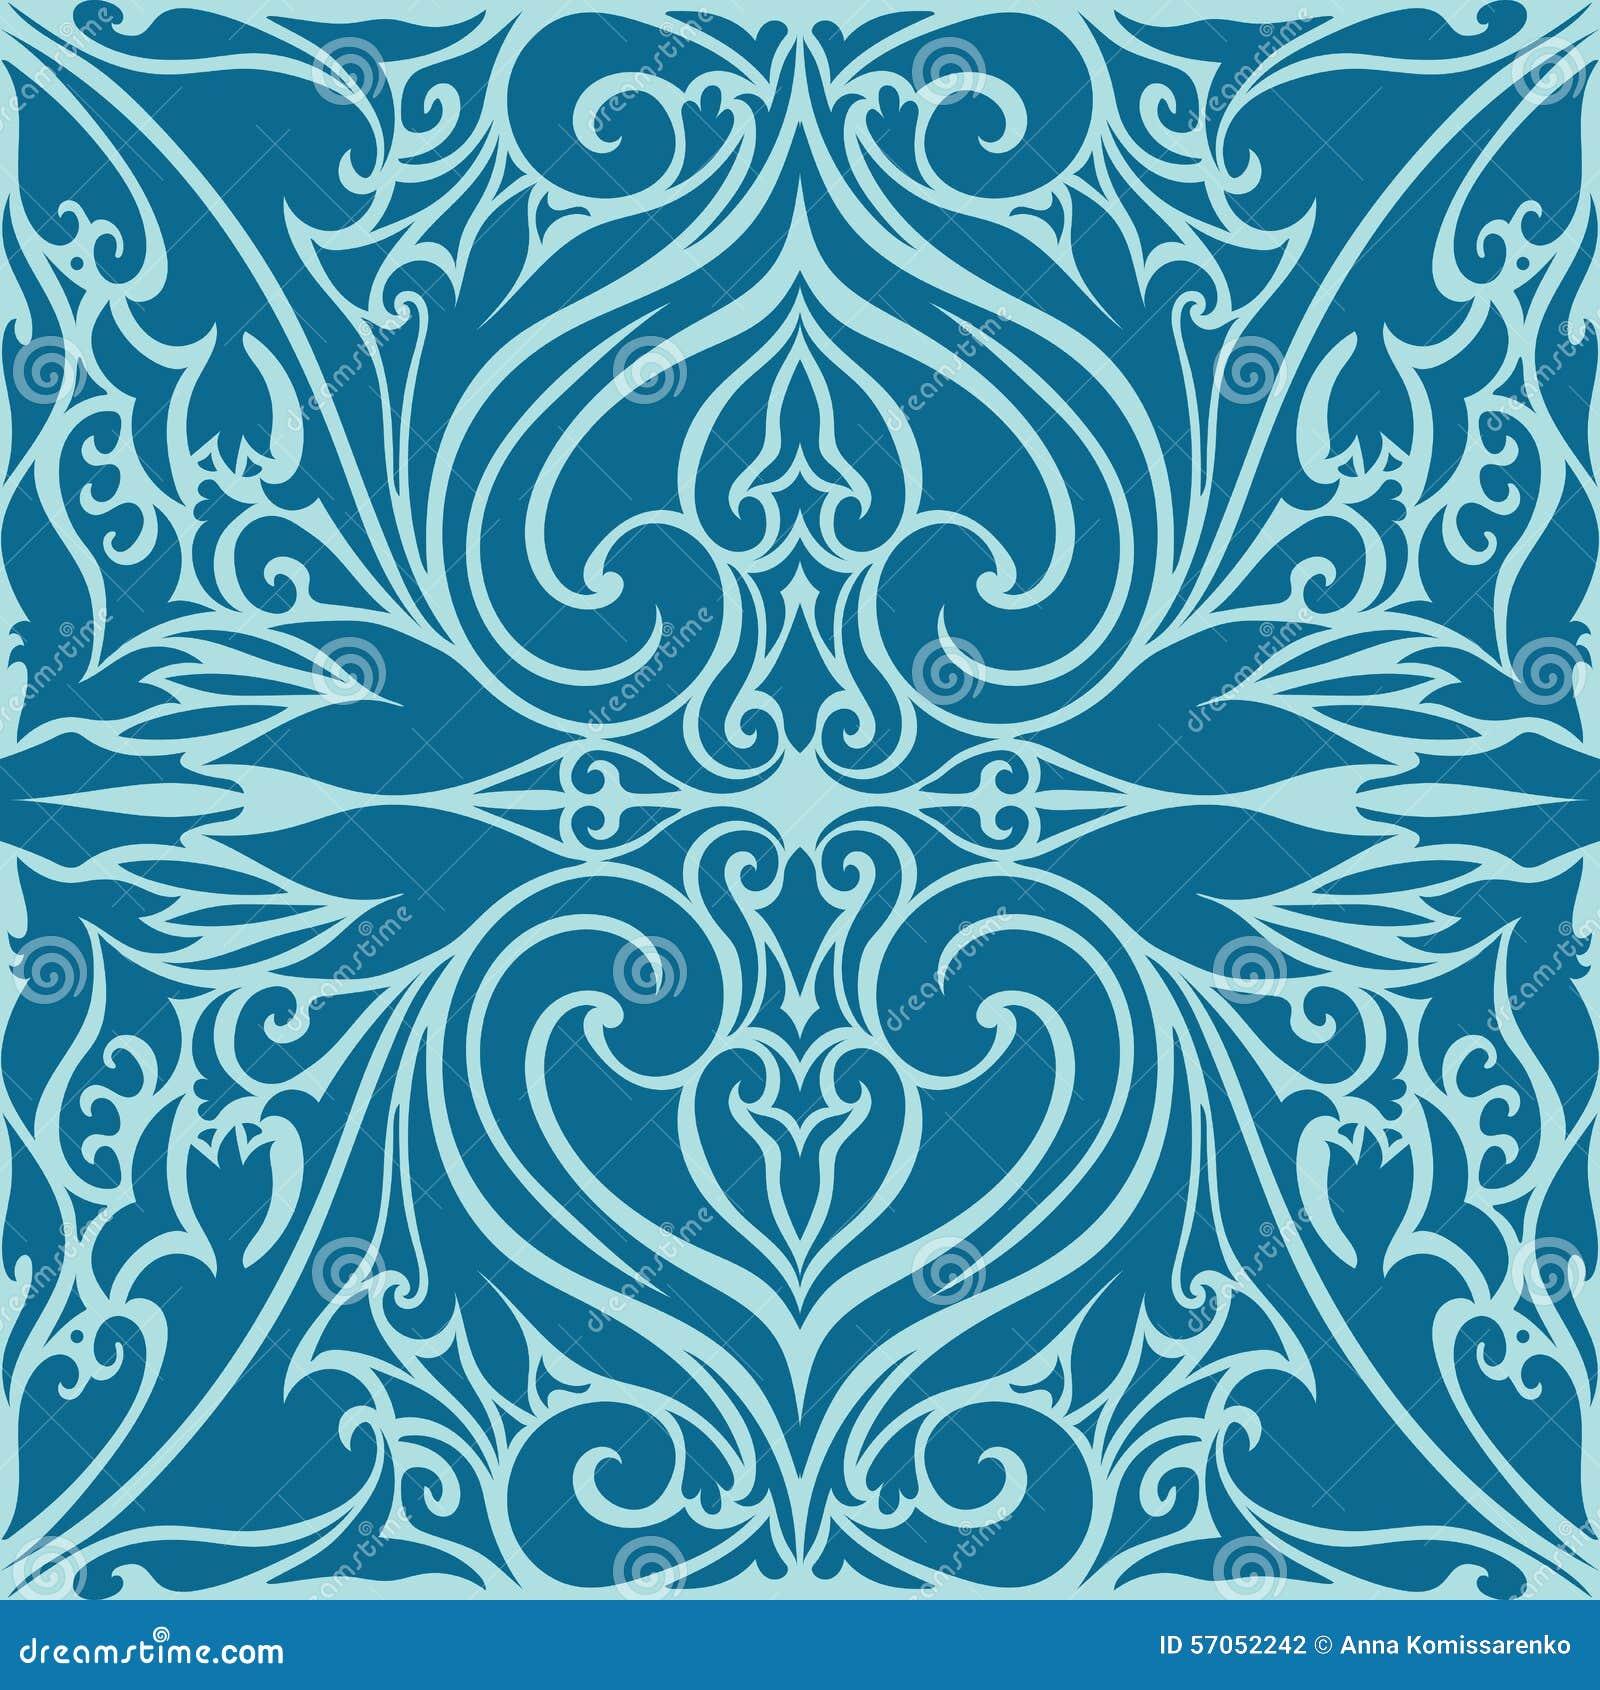 Islamitisch Art Ornaments Pattern